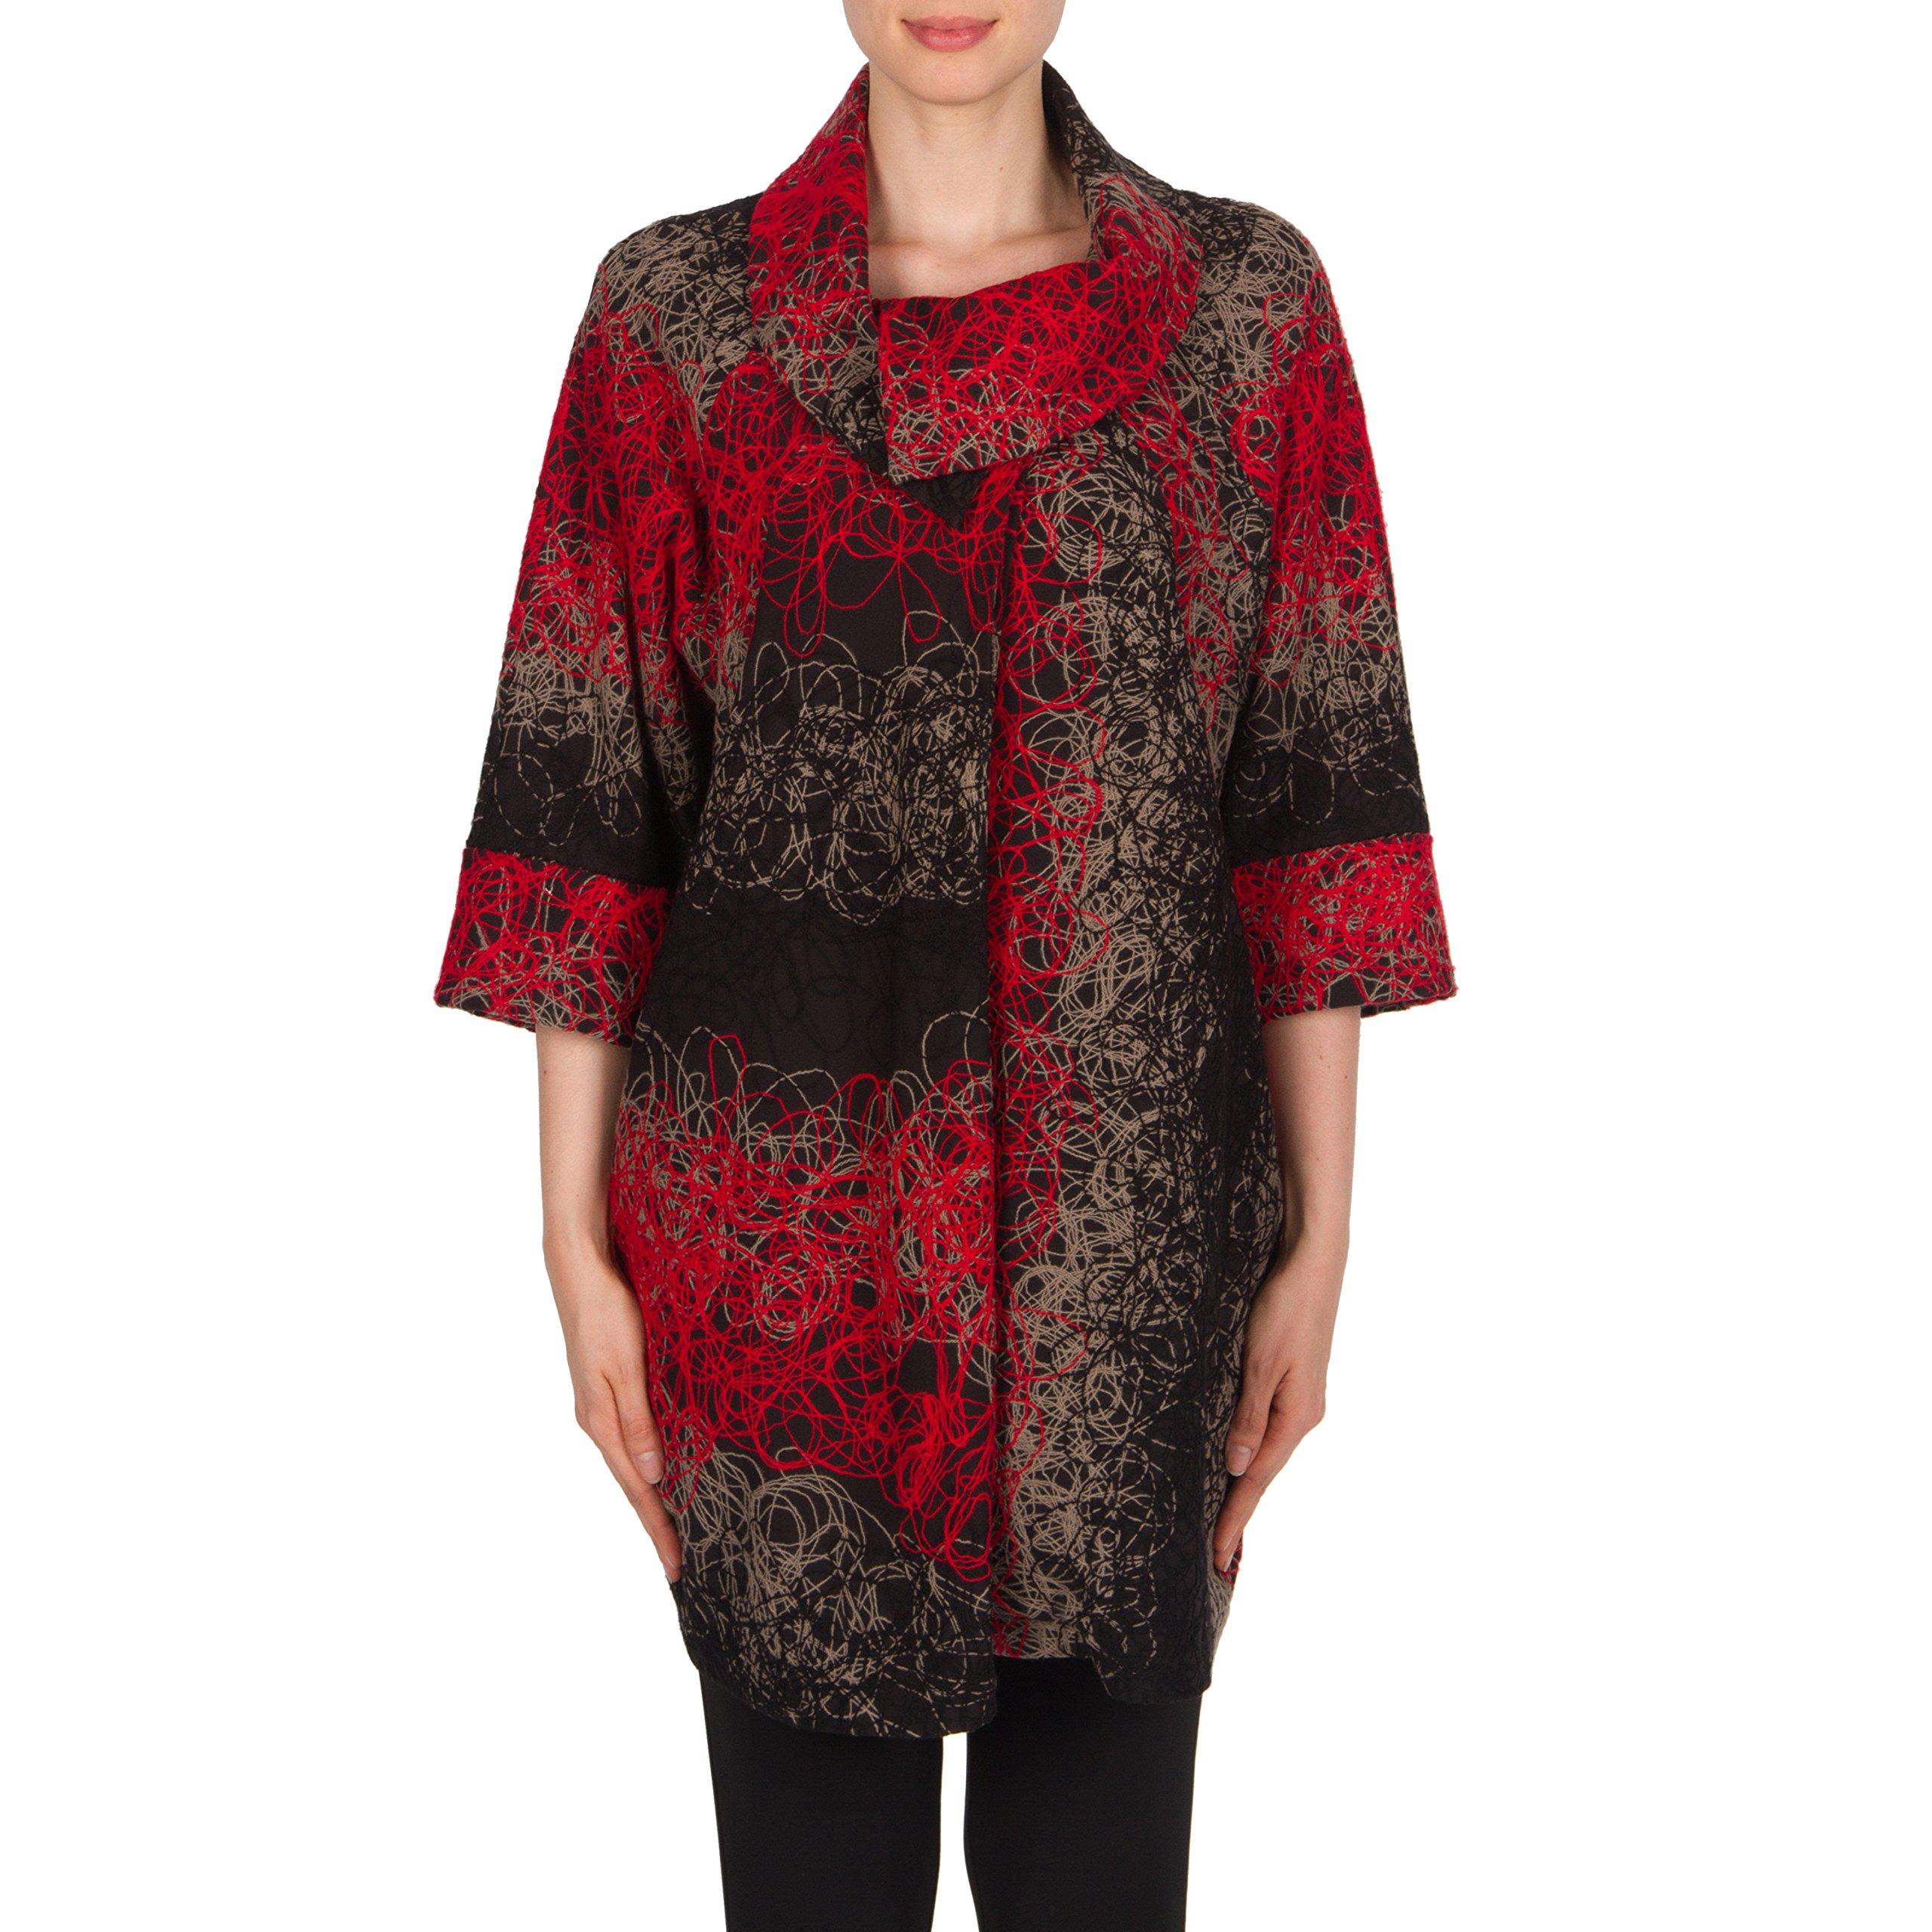 Joseph Ribkoff Textured Long Swing Jacket Style 174606 Size 8